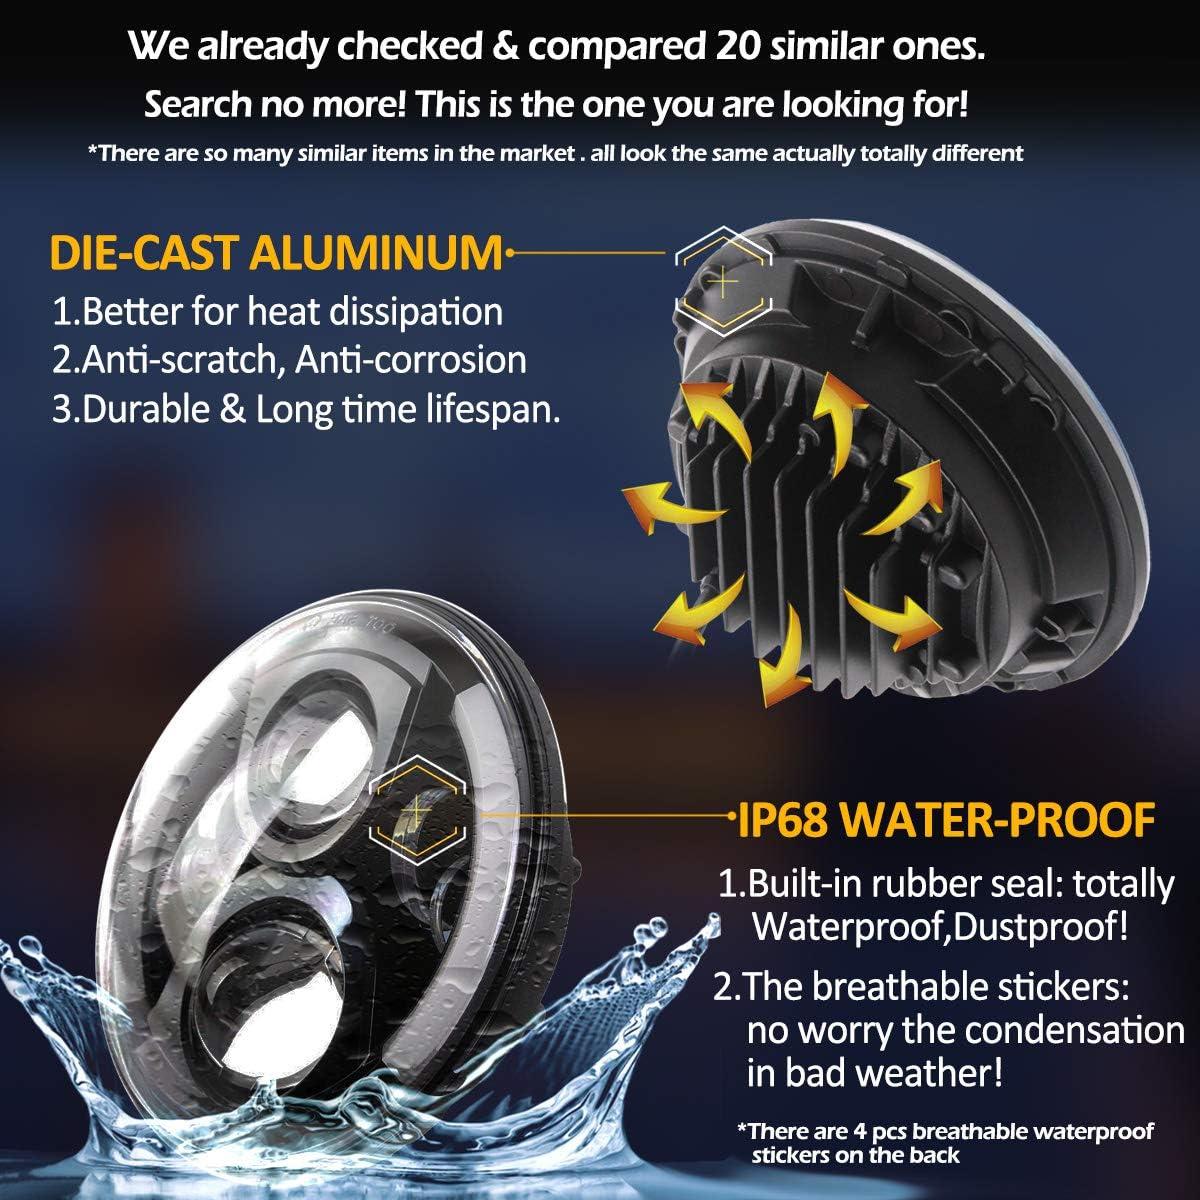 7 Inch LED Headlight DOT DRL Light Halo Bulb for Electra Glide Street Glide Fat Boy Road King Heritage Softail Switchback Headlamp Black